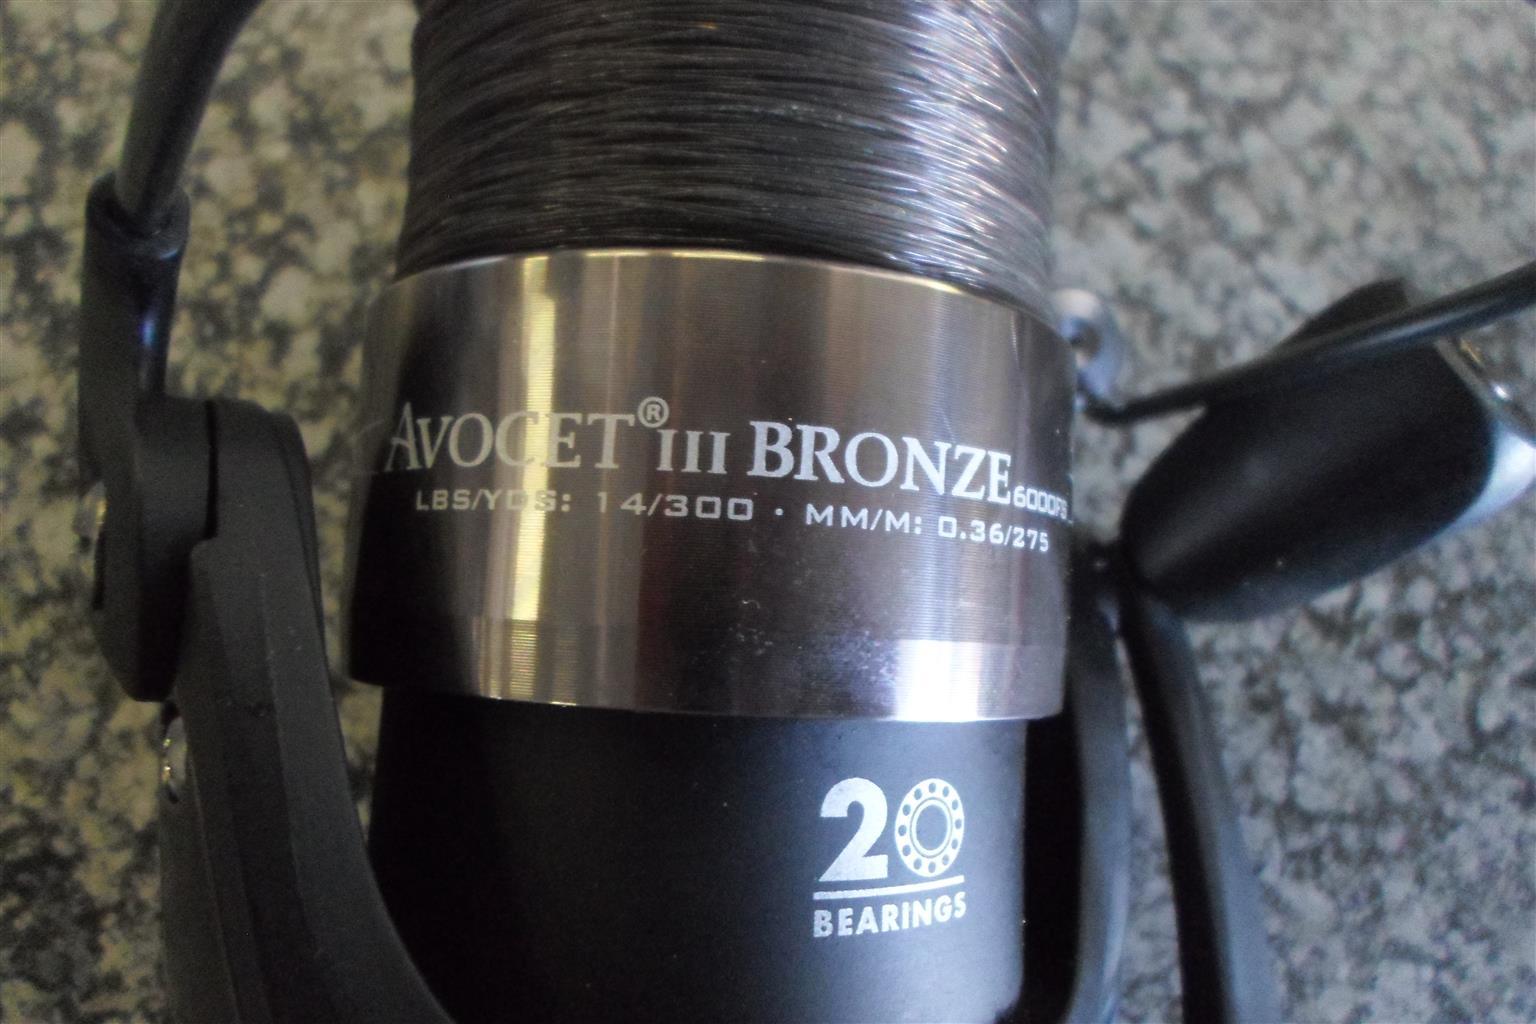 Mitchell Avocet lll Bronze 6000FS Reel